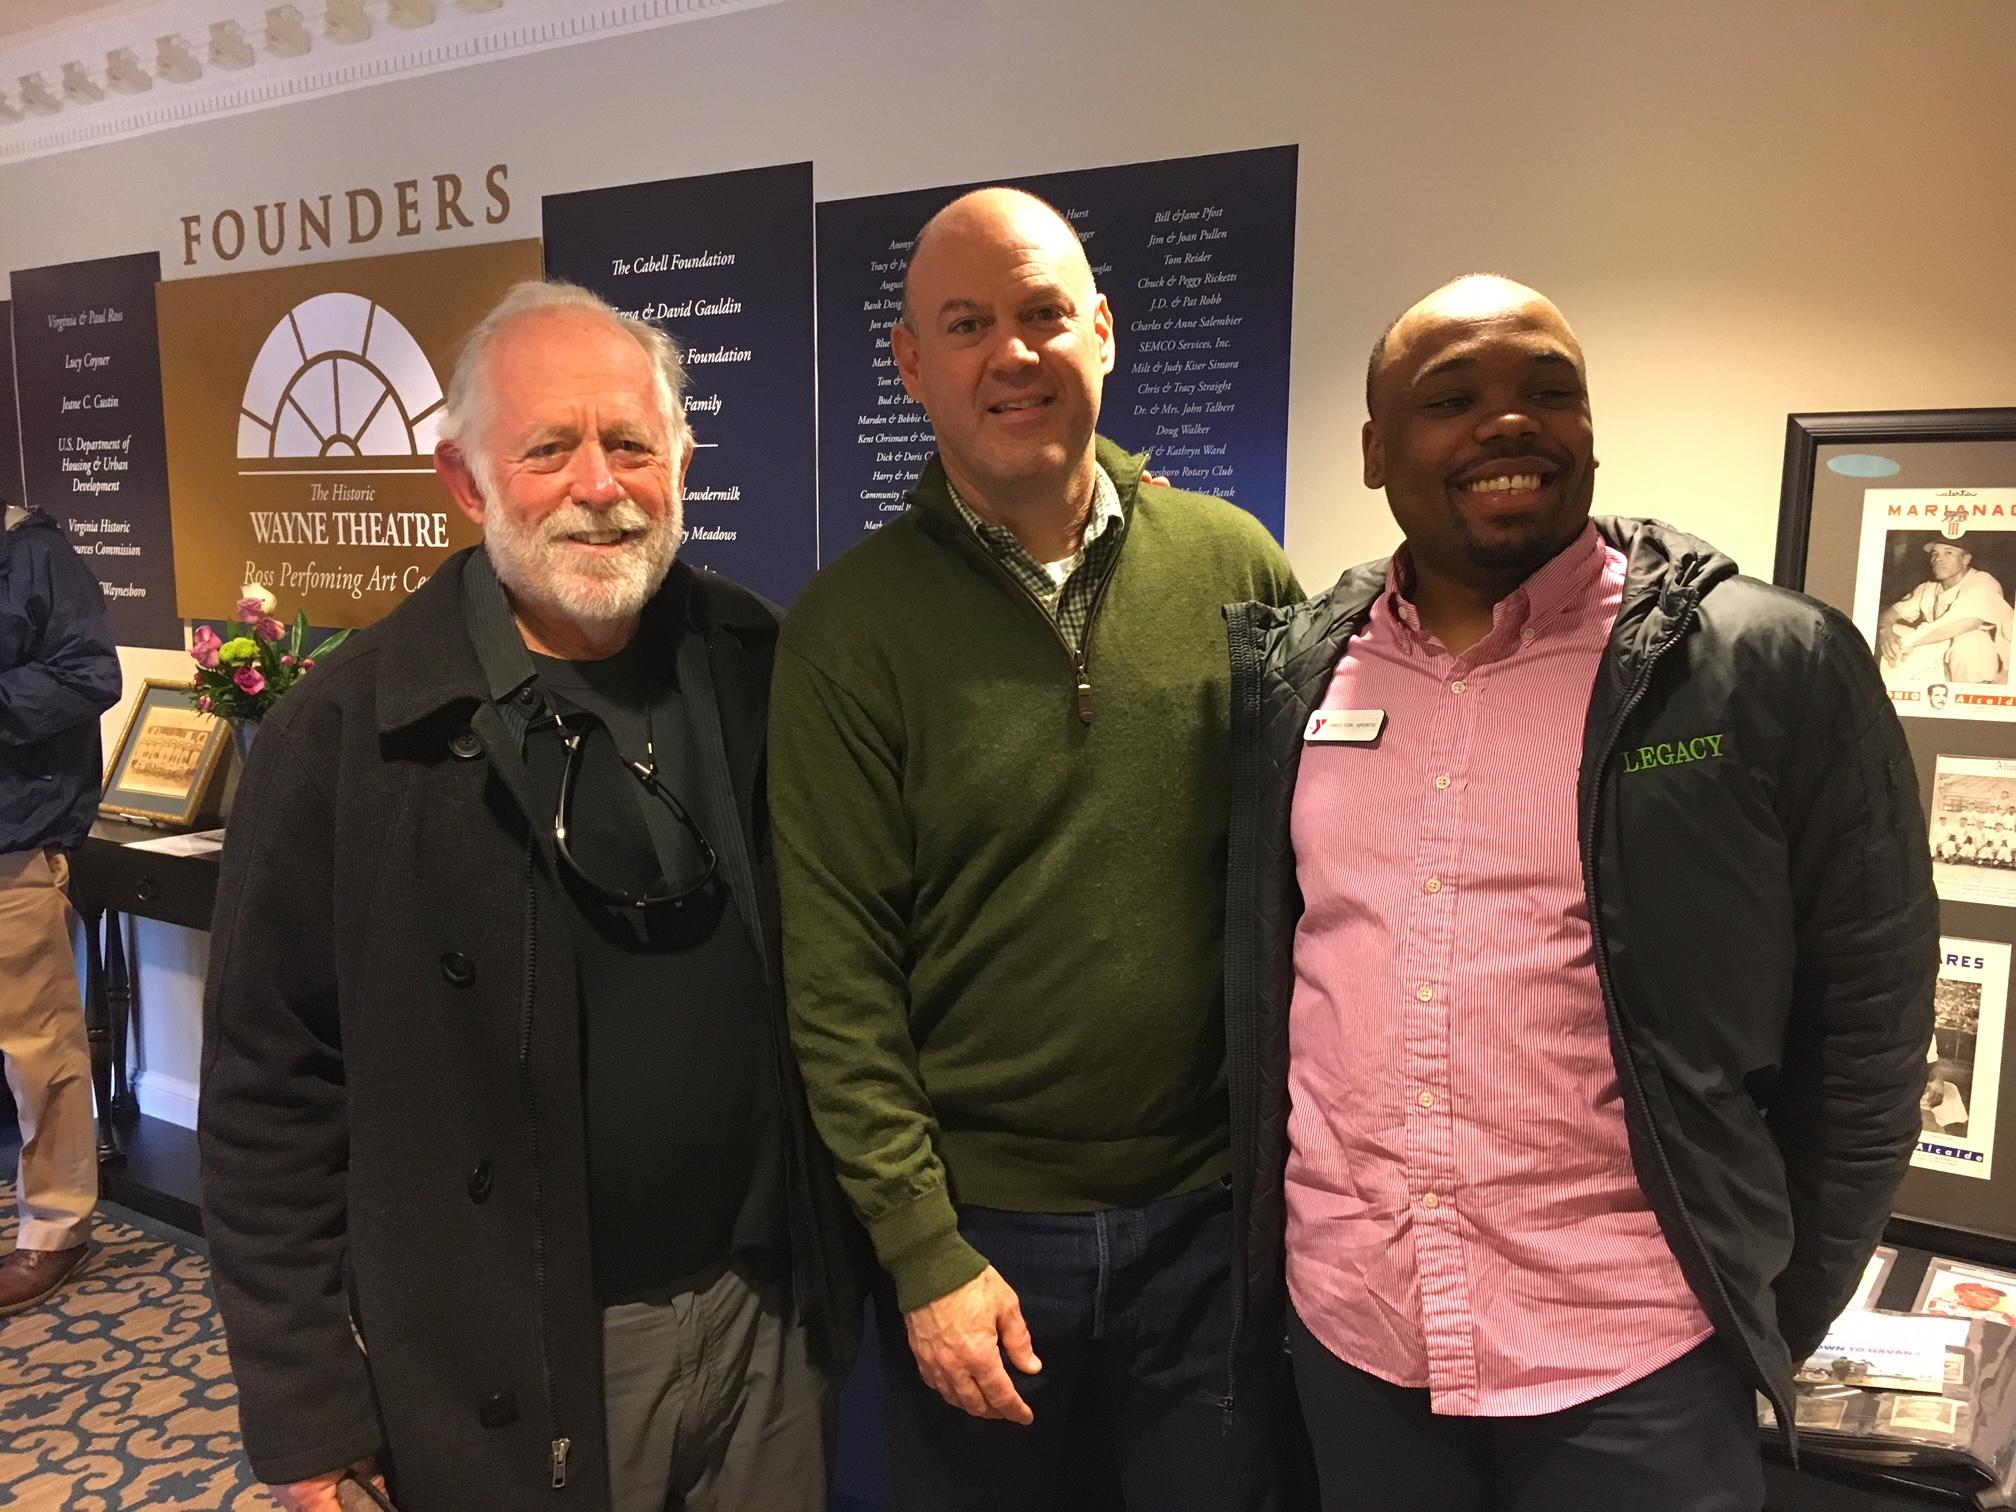 Filmmaker Corr with panelists Tom Hardiman, Boys and Girls Club & Melvin Garrison, YMCA